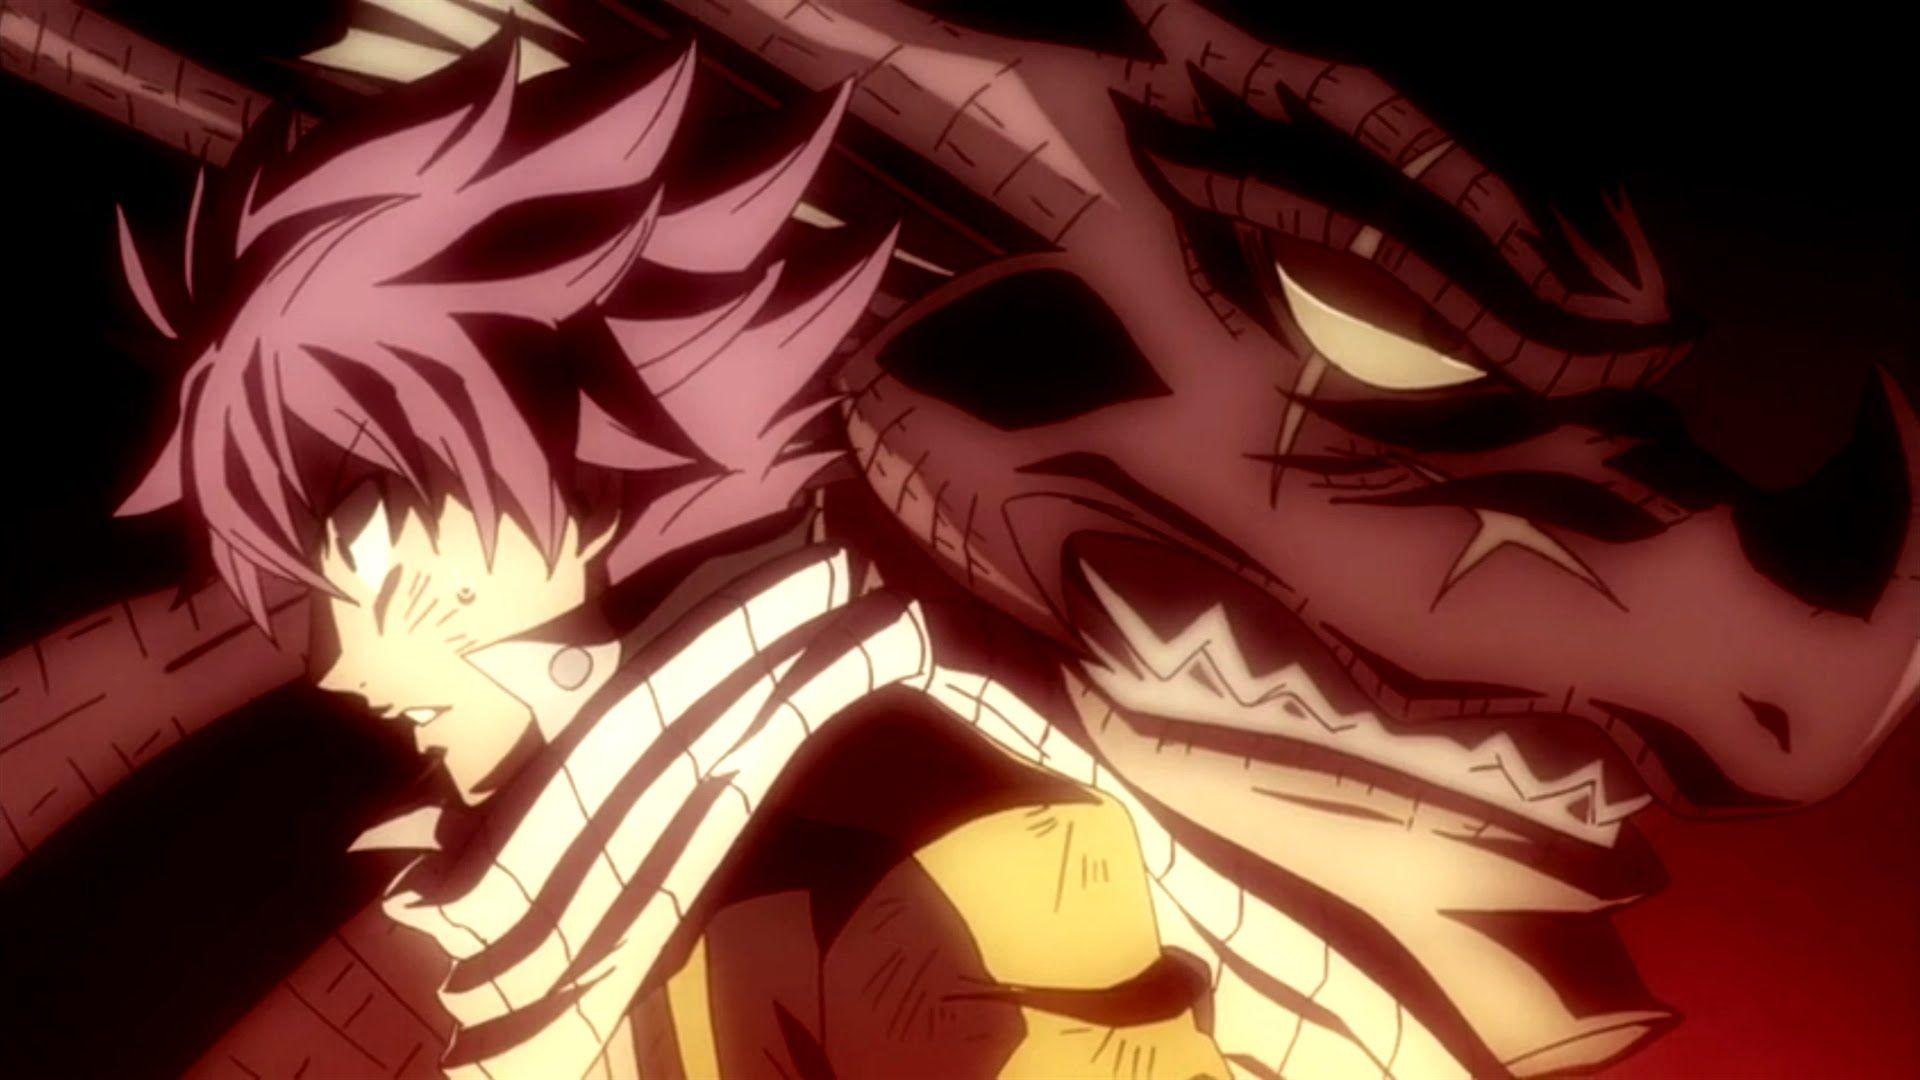 Fairy Tail [AMV] Natsu & Igneel Vs Mard Geer & Acnologia